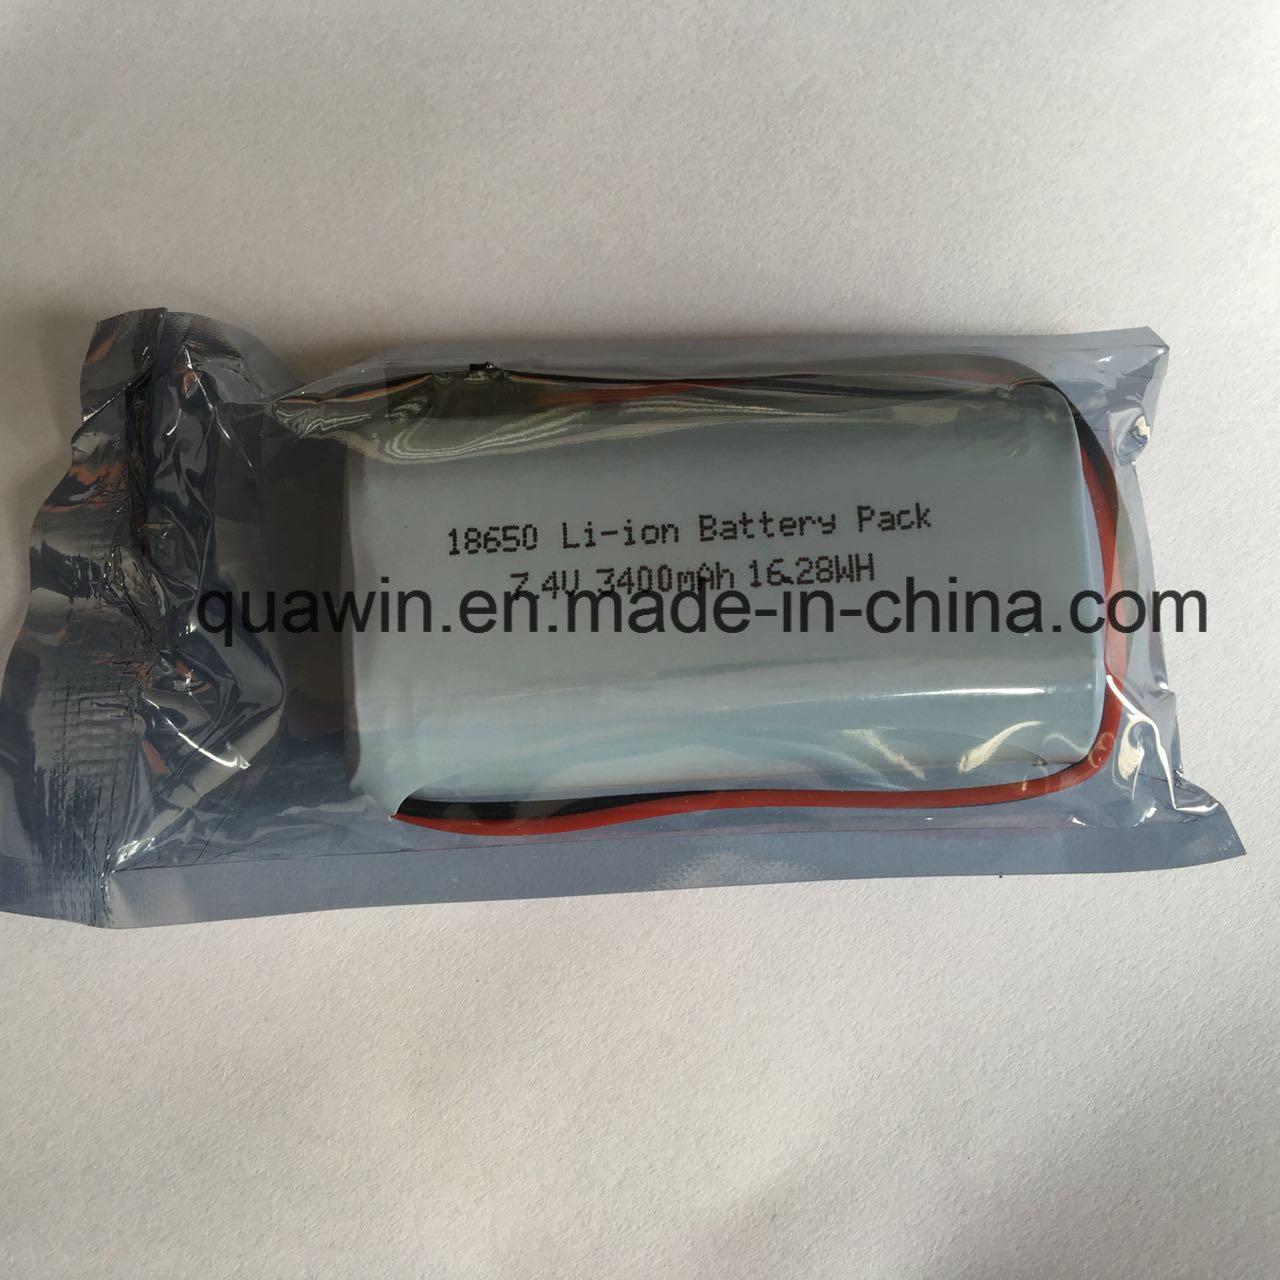 2s1p 7.4V 3400mAh Panasonic Cell 18650 Lithium-Ion Battery Pack